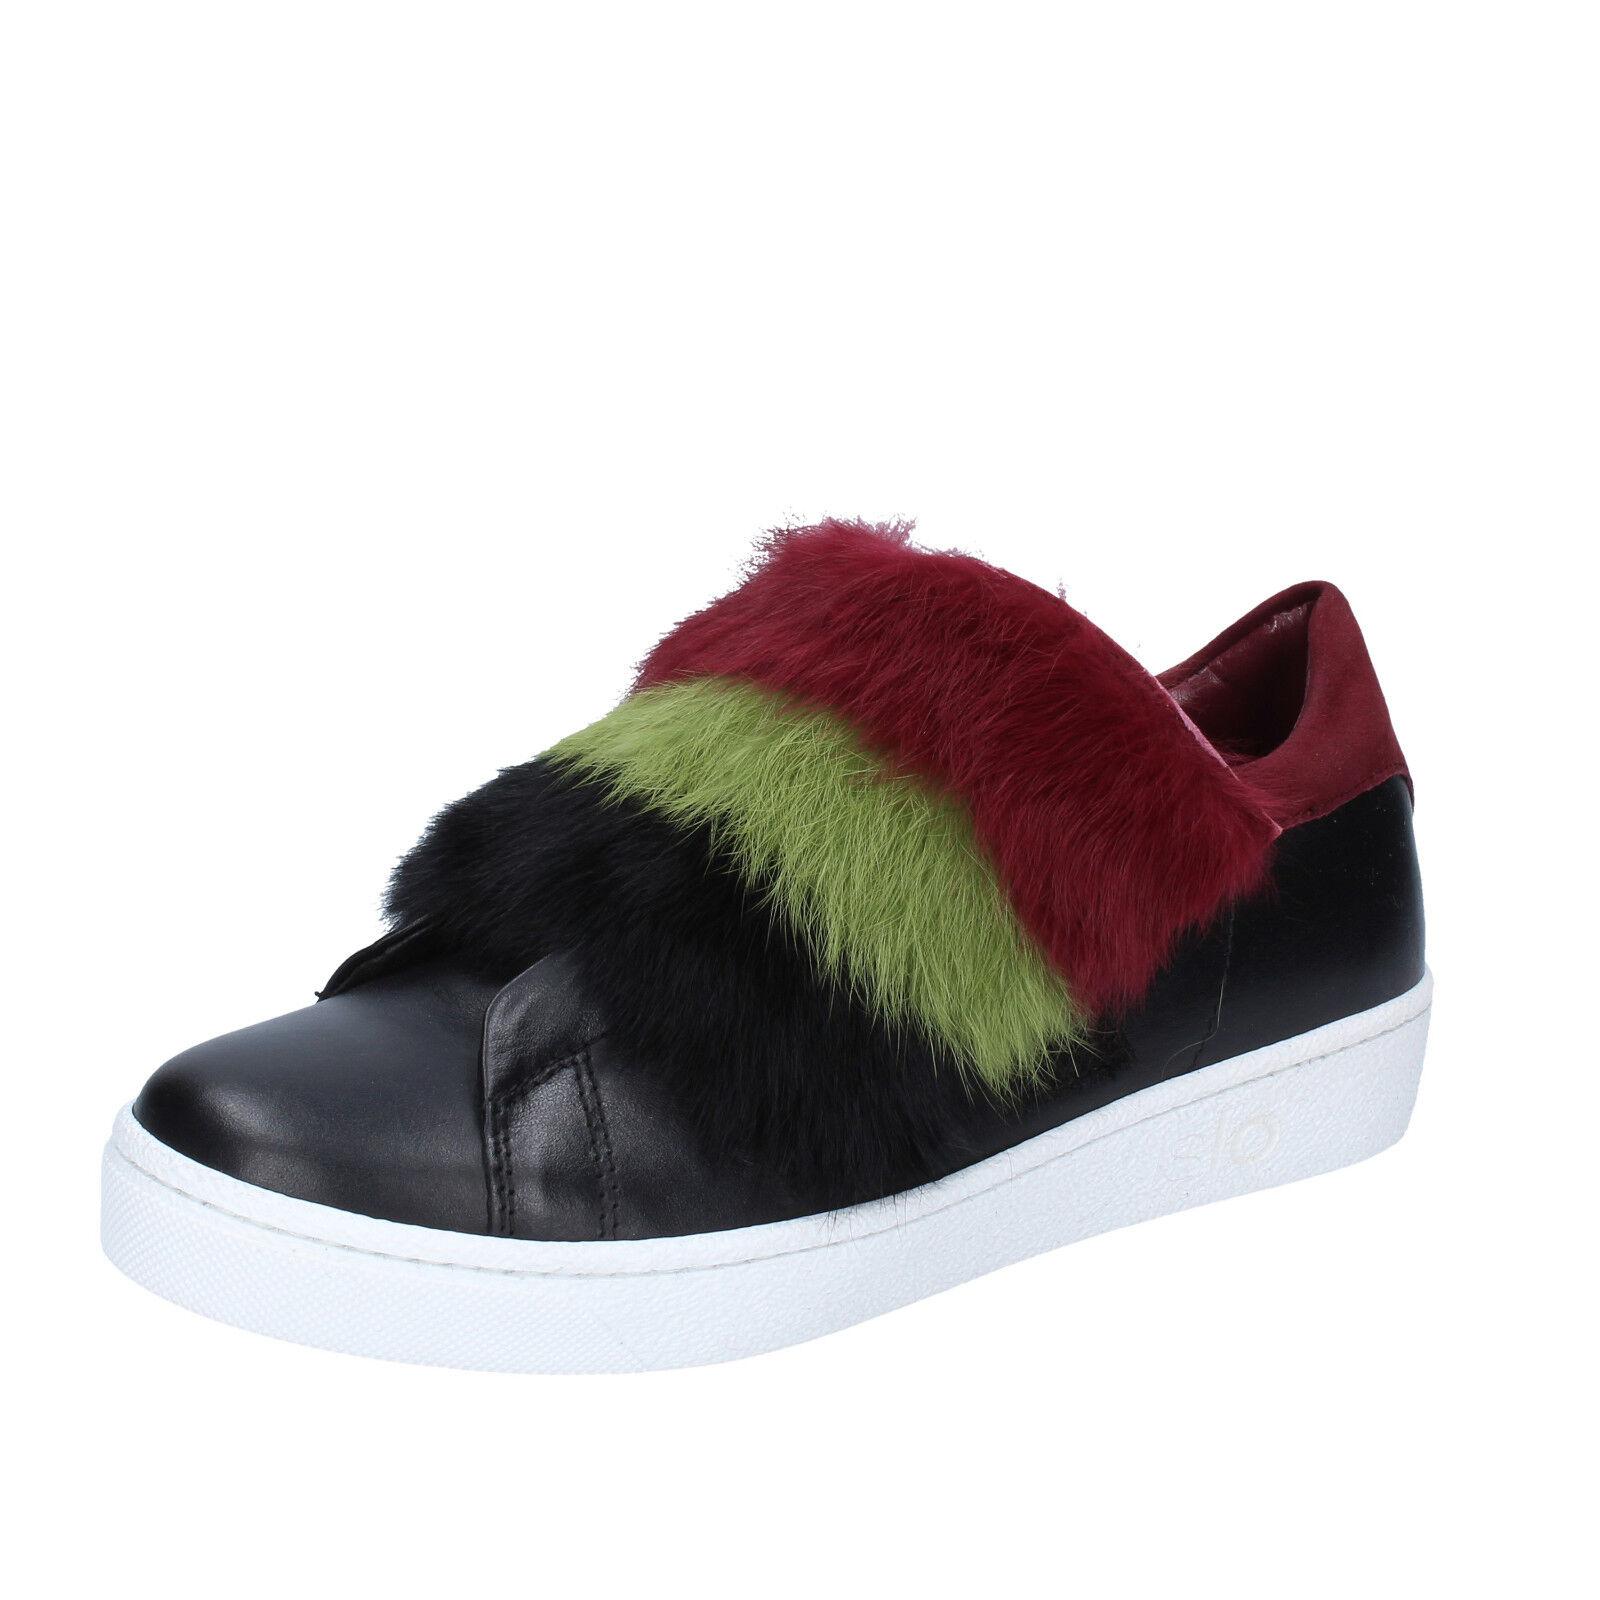 scarpe donna ISLO sneakers ISABELLA LORUSSO 37 EU sneakers ISLO nero bordeaux pelle BZ214-C ba1a32